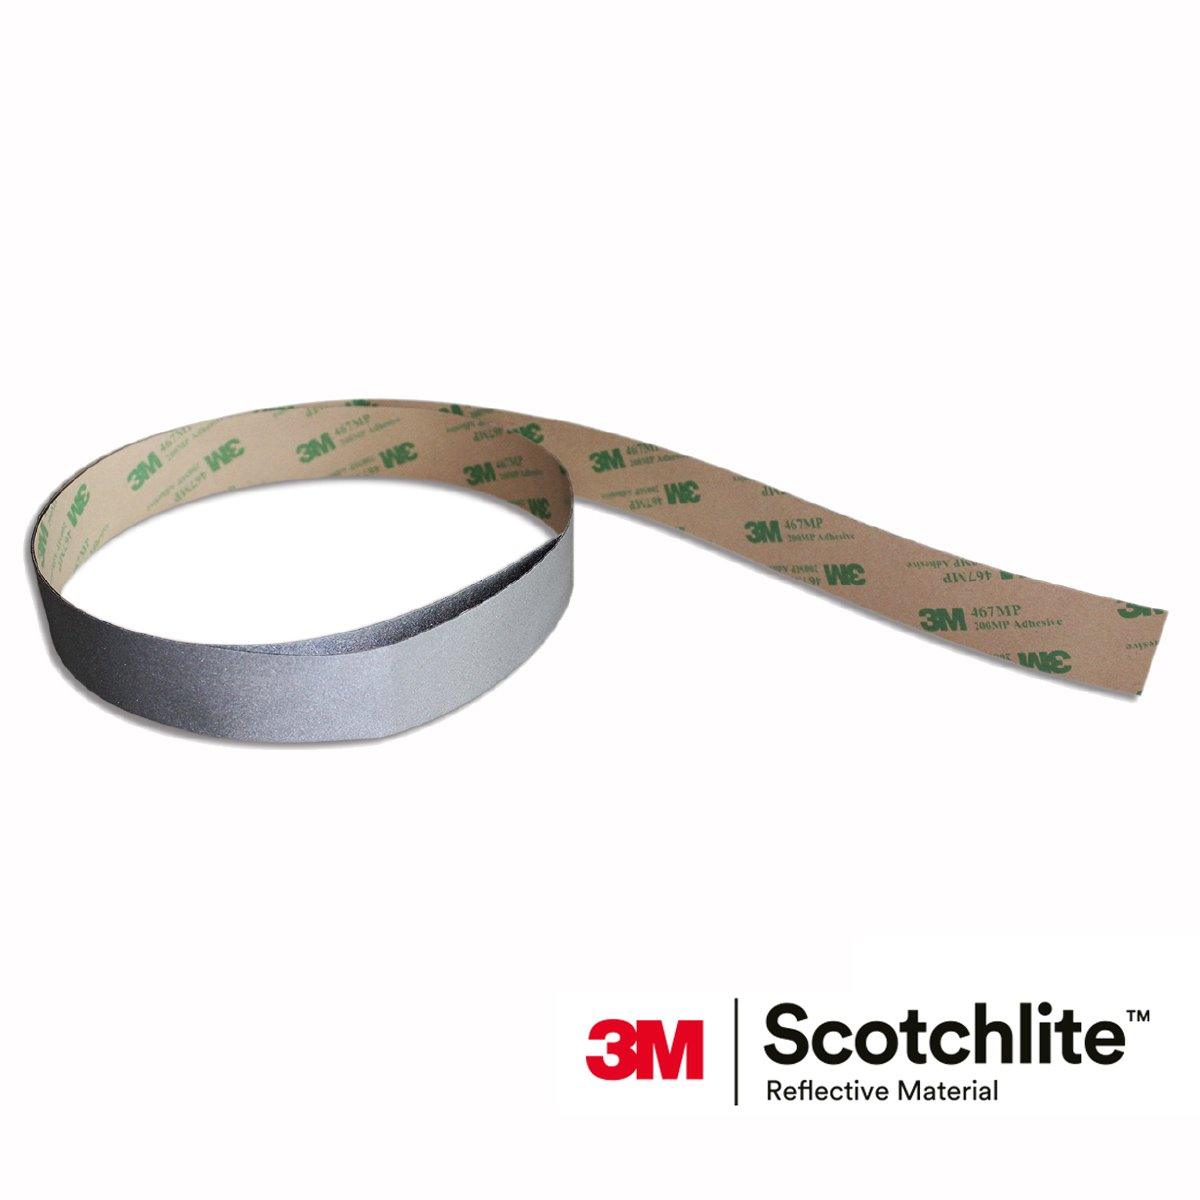 Salzmann 3M Scotchlite Reflective Sticker, High Visible Reflective Sticker, Silver, 1'' x 39'', 1 Roll